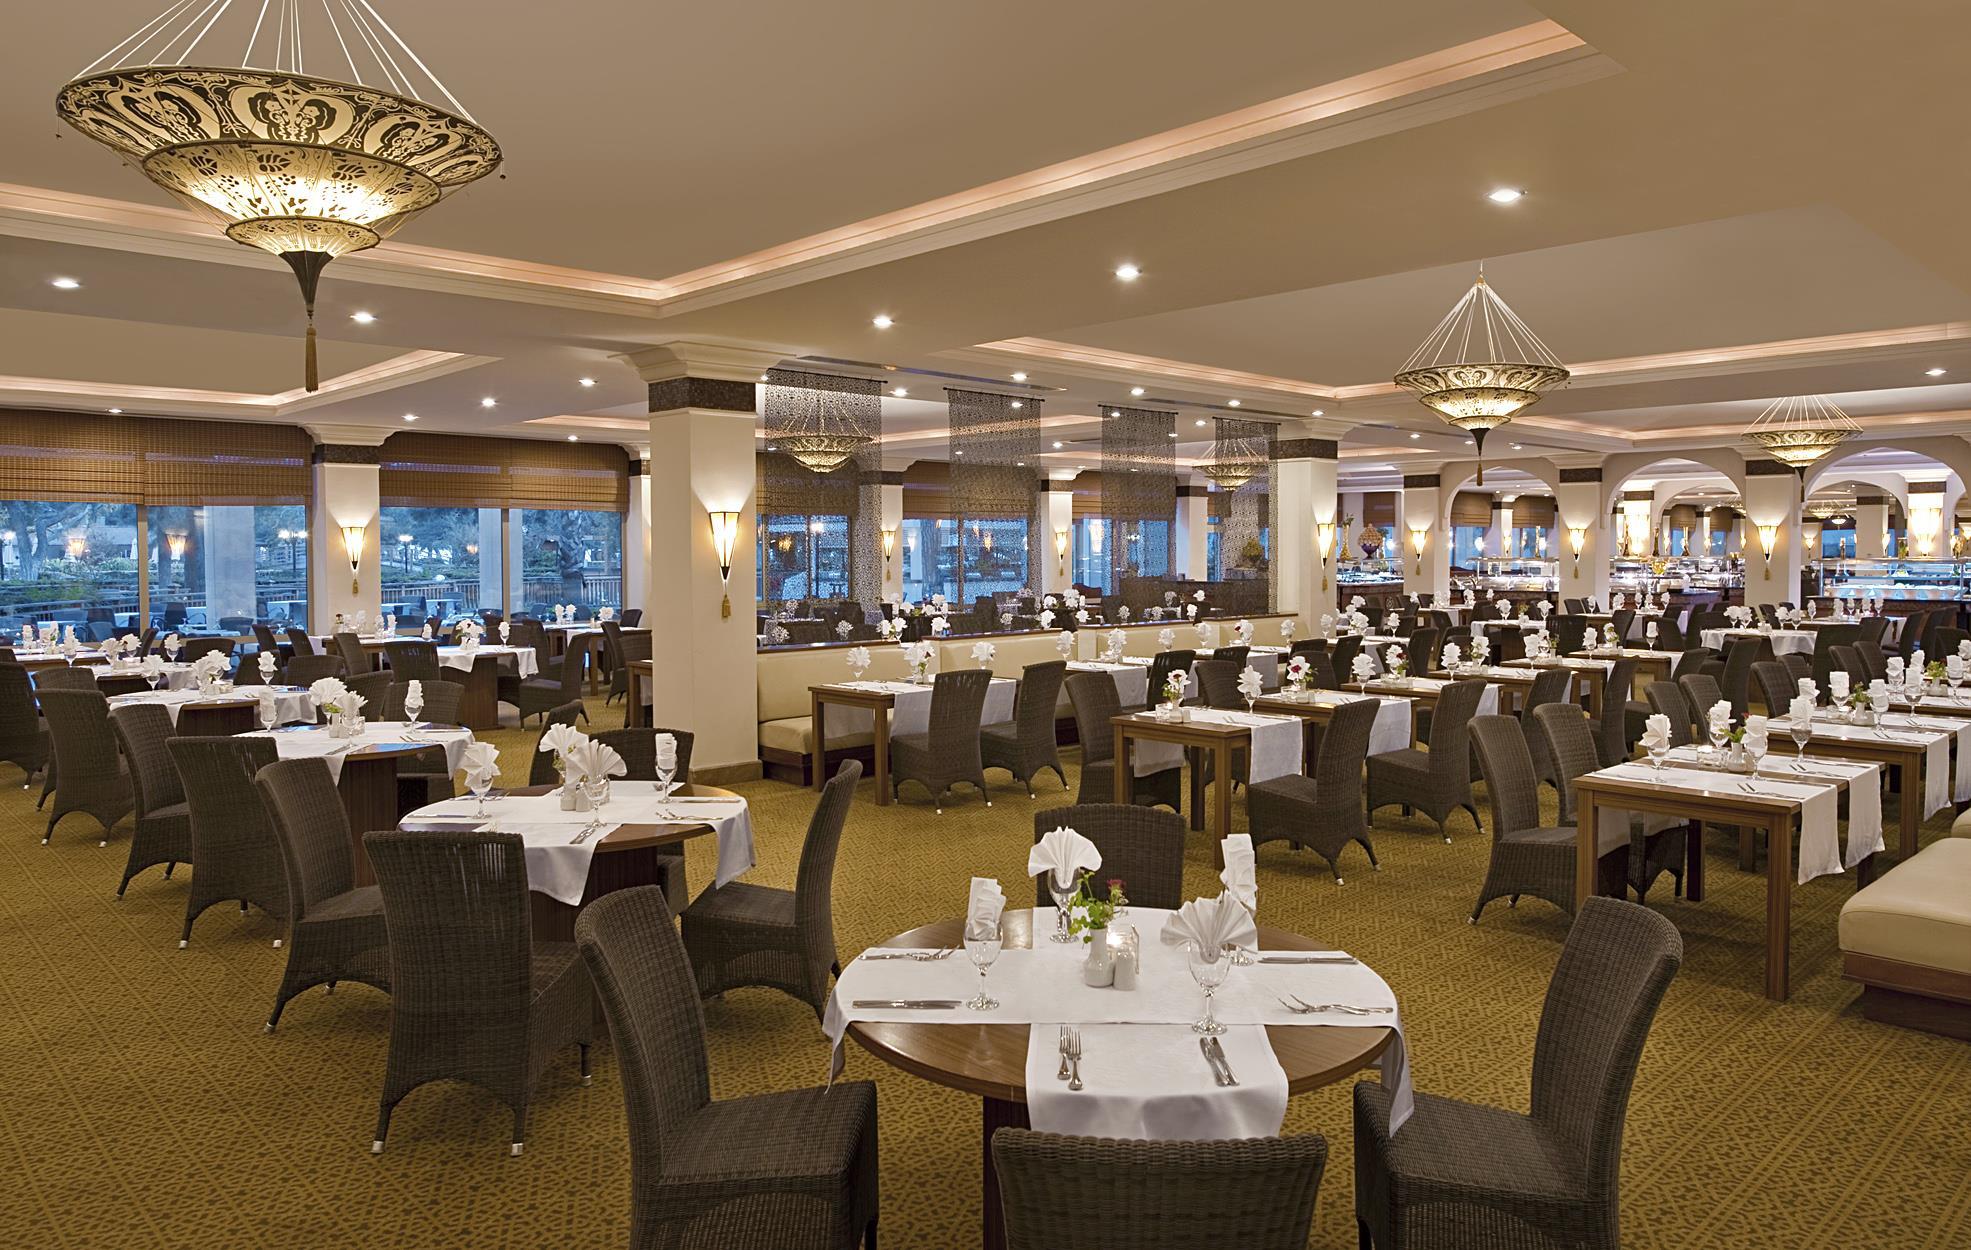 http://www.orextravel.sk/OREX/hotelphotos/akka-hotels-antedon-general-006.jpg